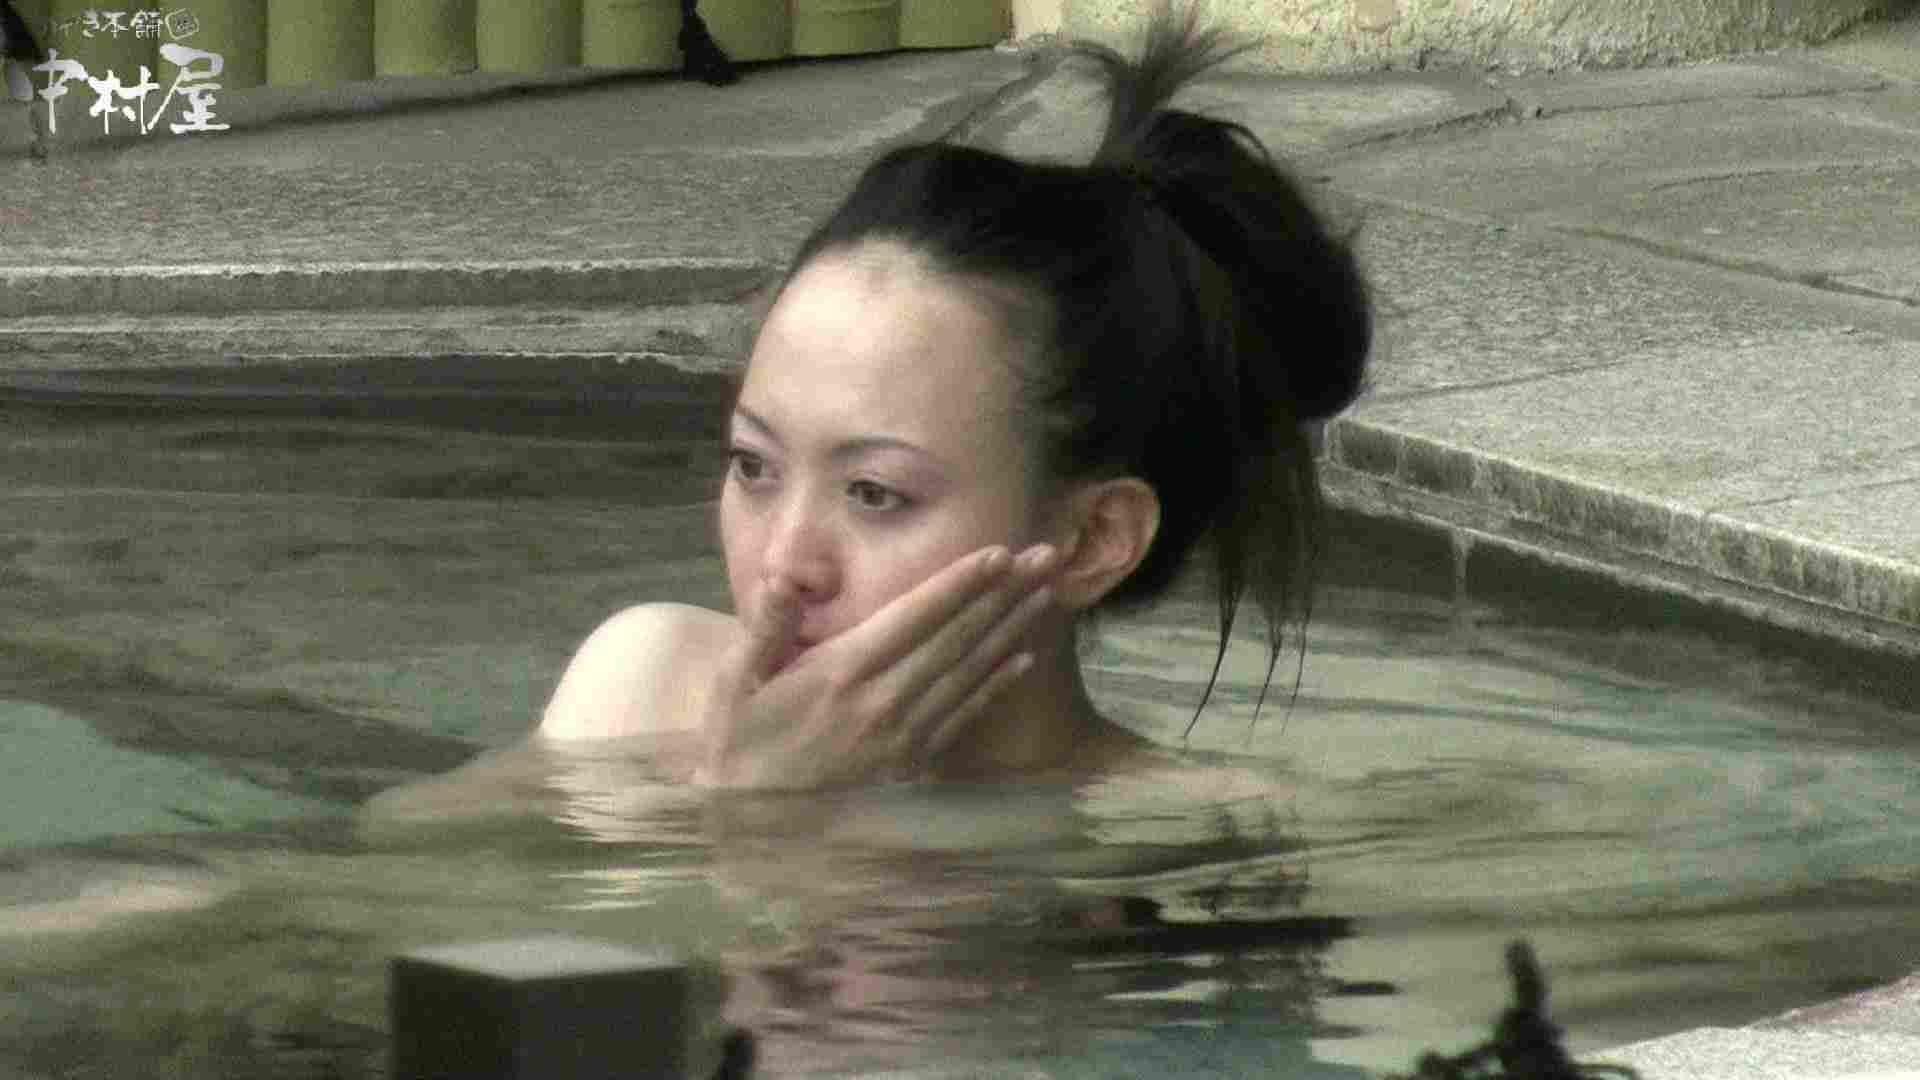 Aquaな露天風呂Vol.900 盗撮シリーズ | 露天風呂編  110PIX 41